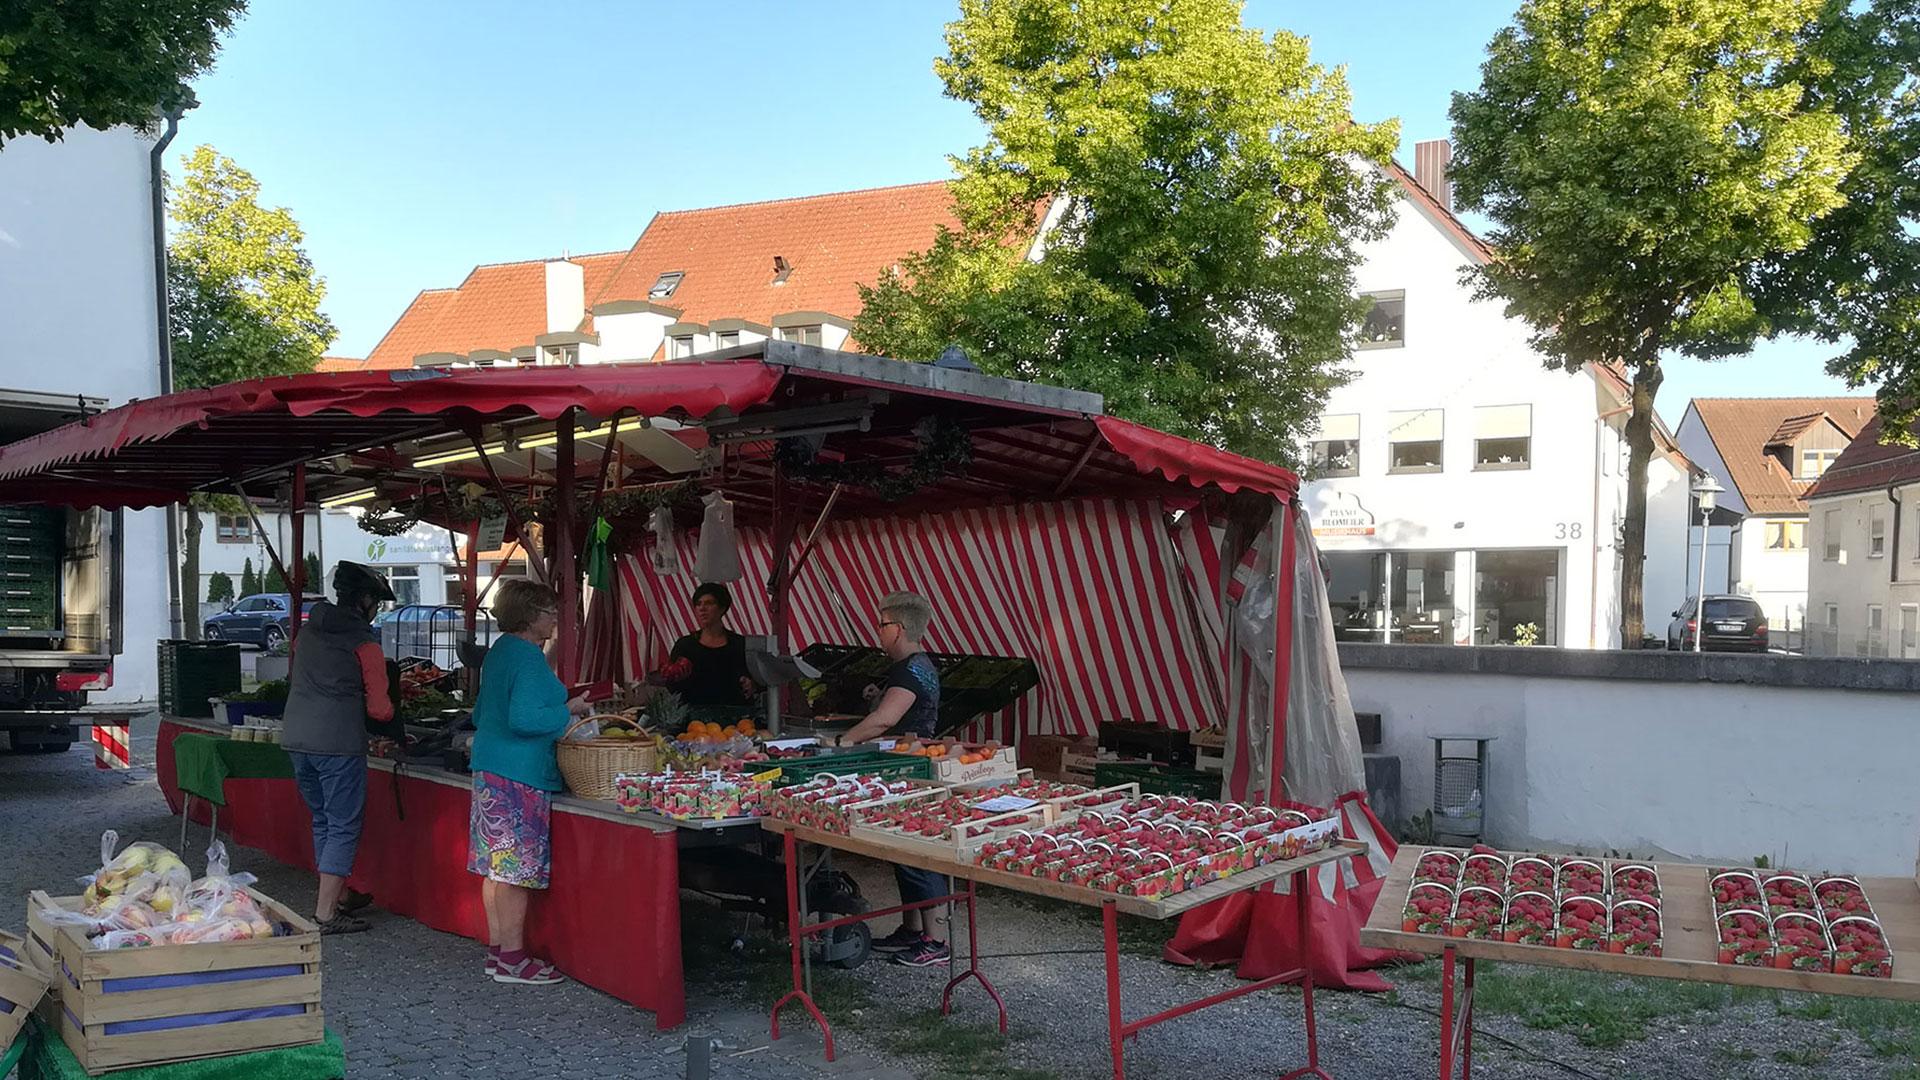 Wochenmärkte3Wochenmarkt Langenau